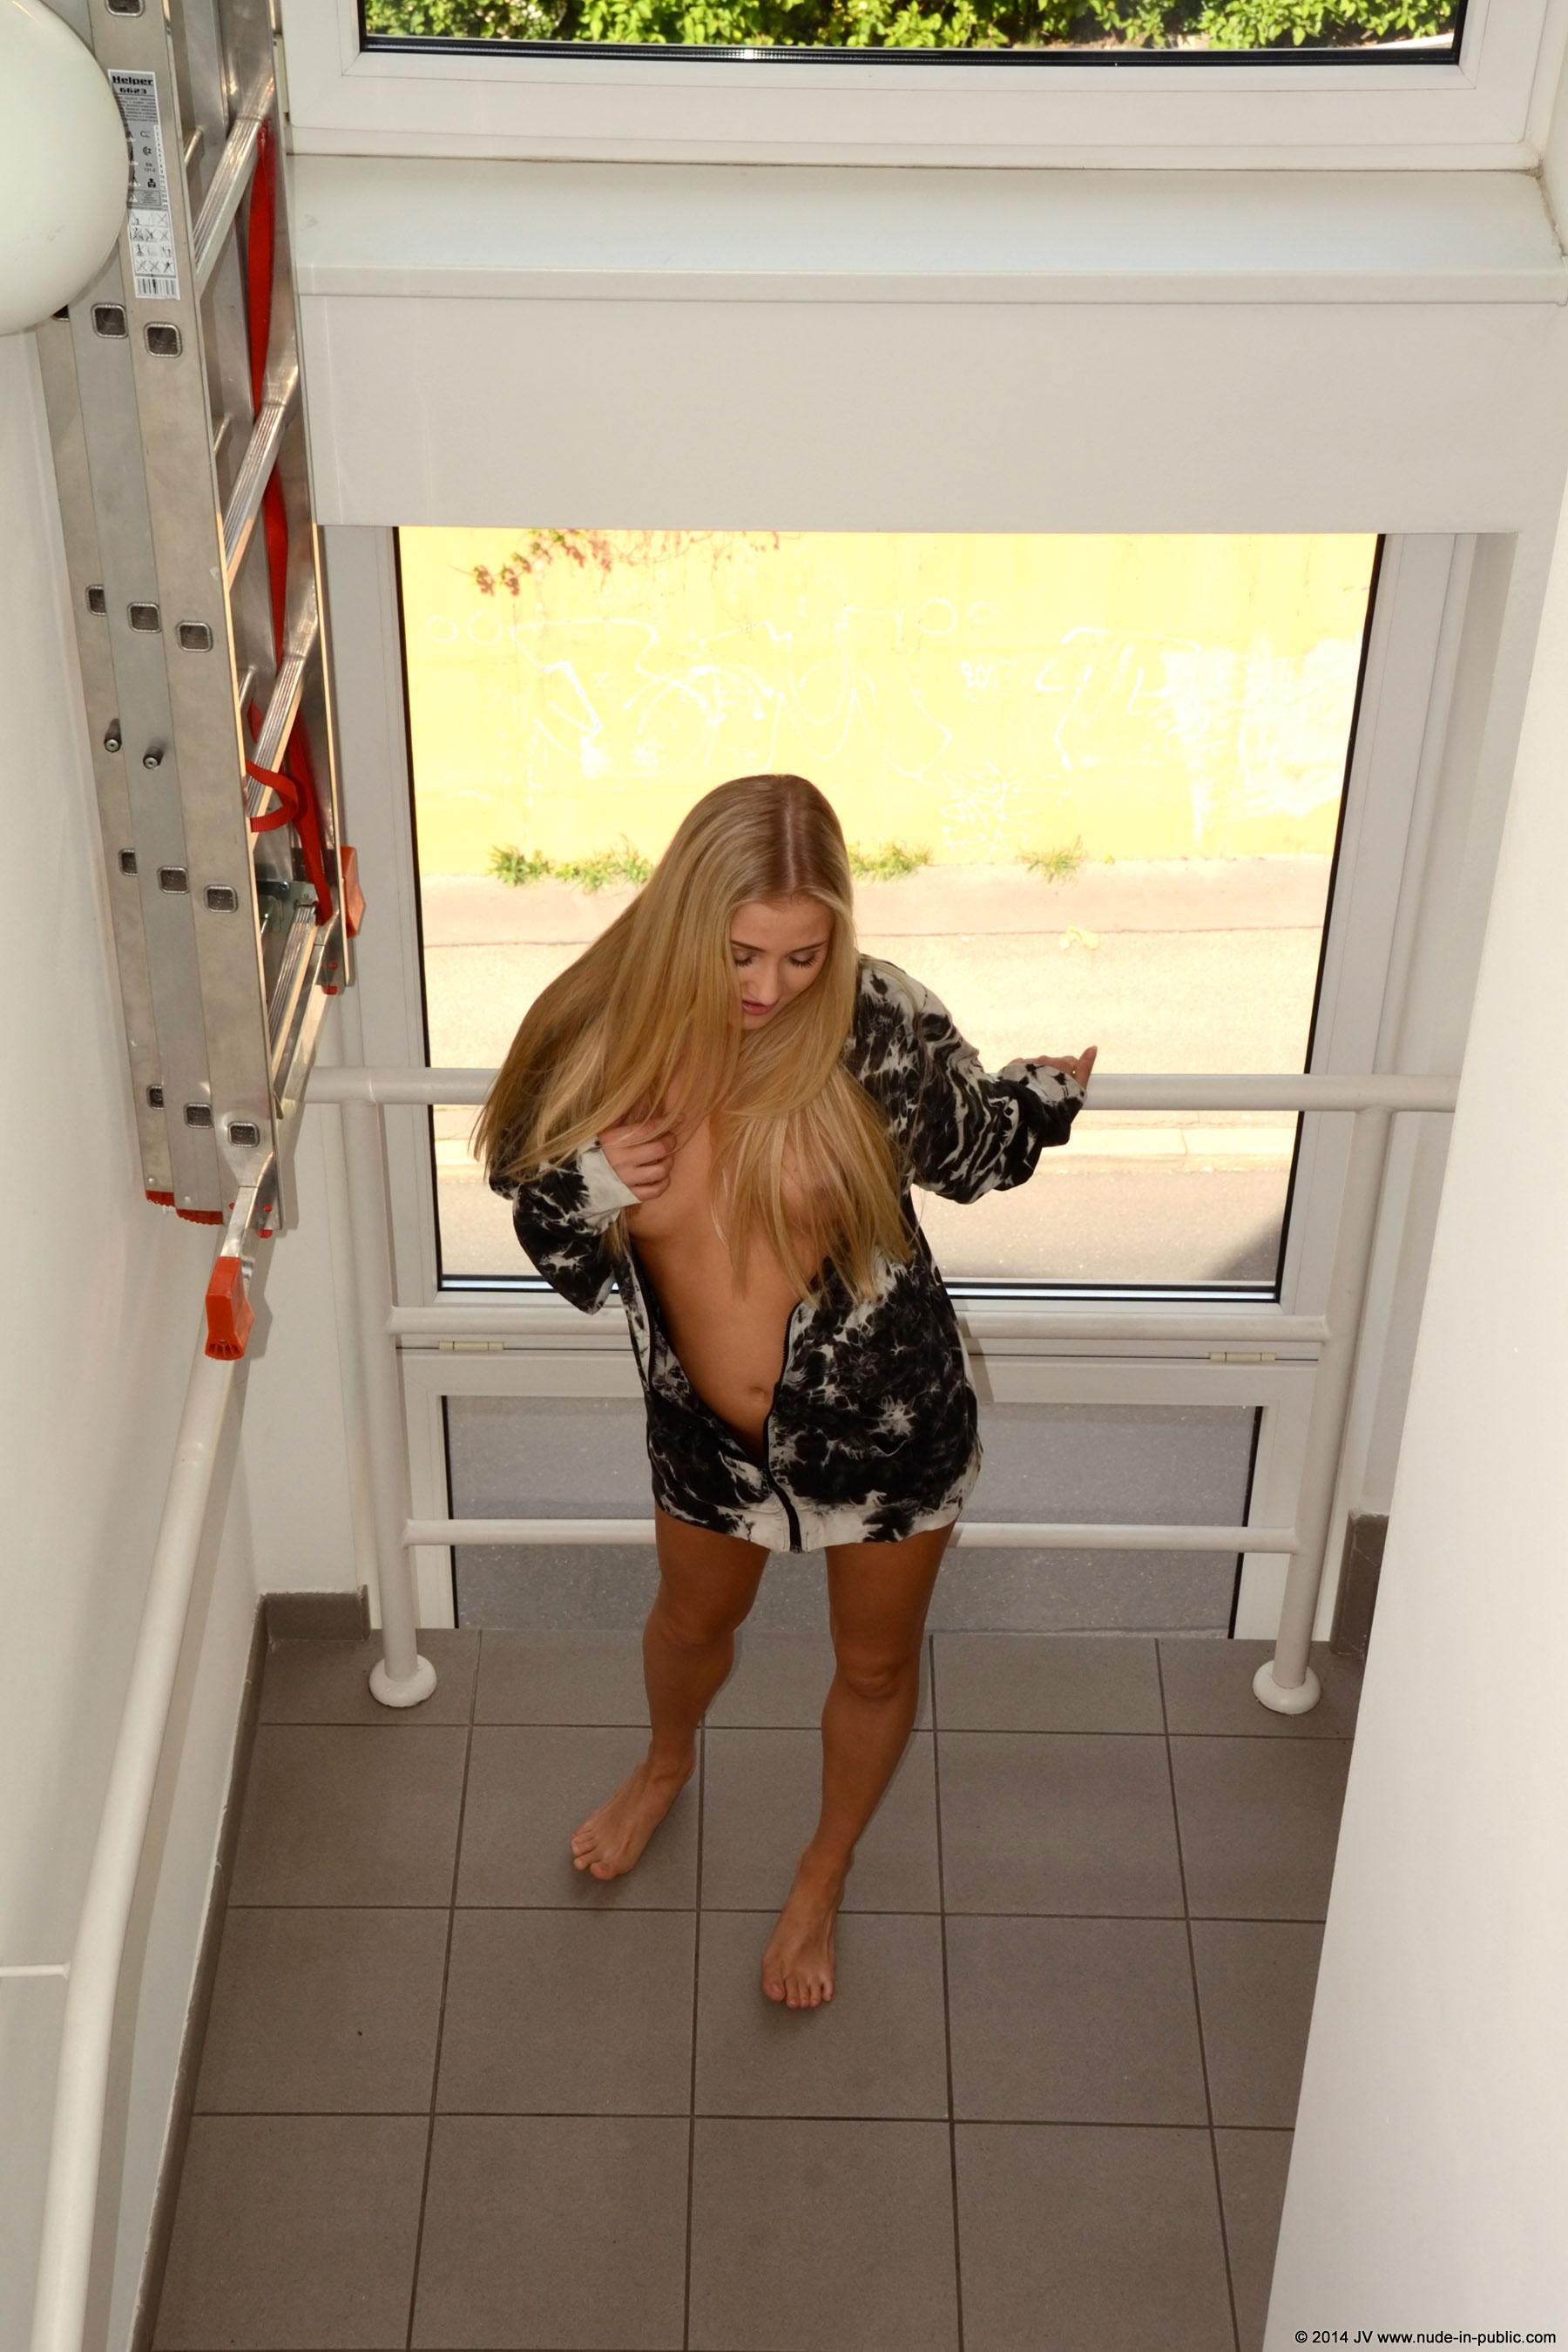 karolina-m-blonde-on-the-street-nude-in-public-02